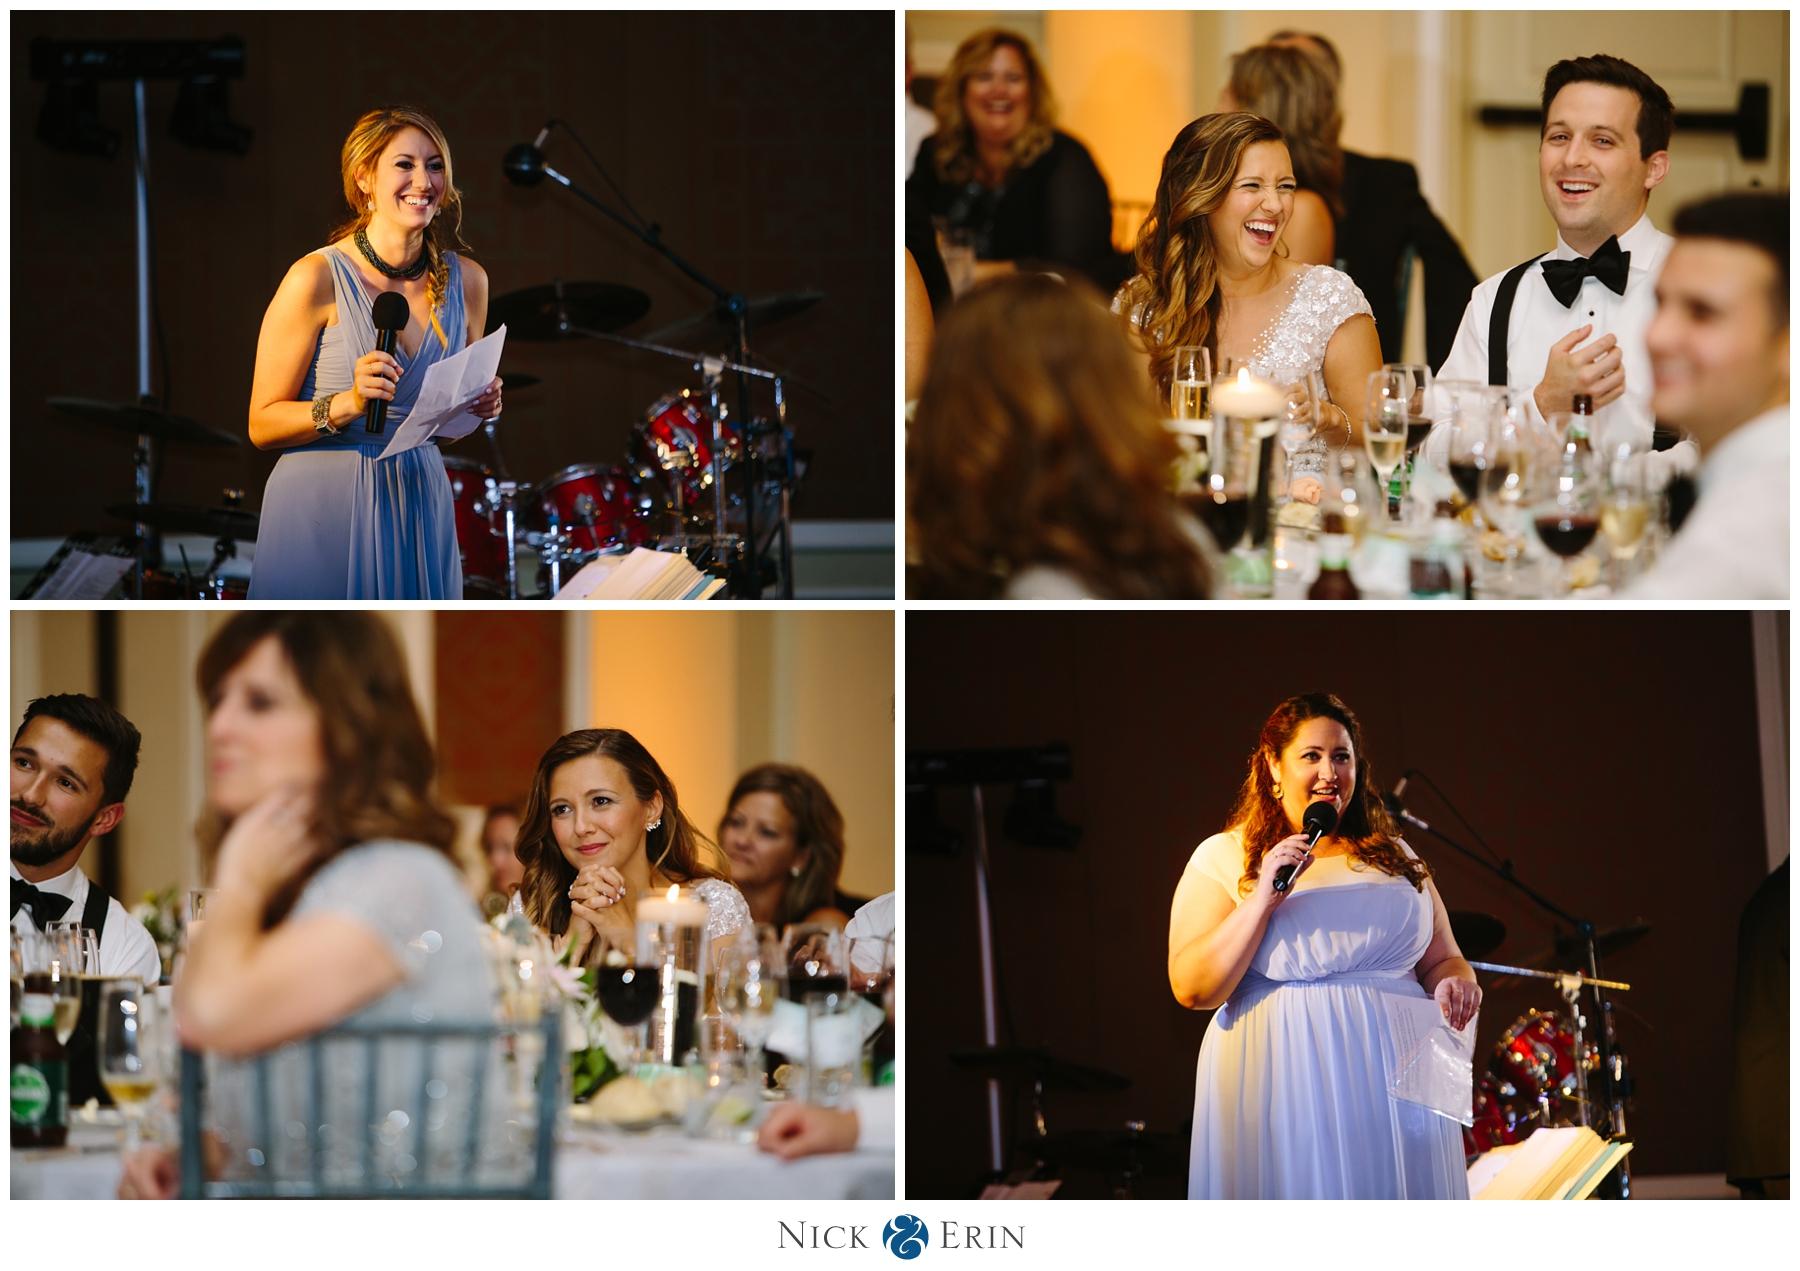 donner_photography_washington-dc-wedding_ariel-patrick_0068